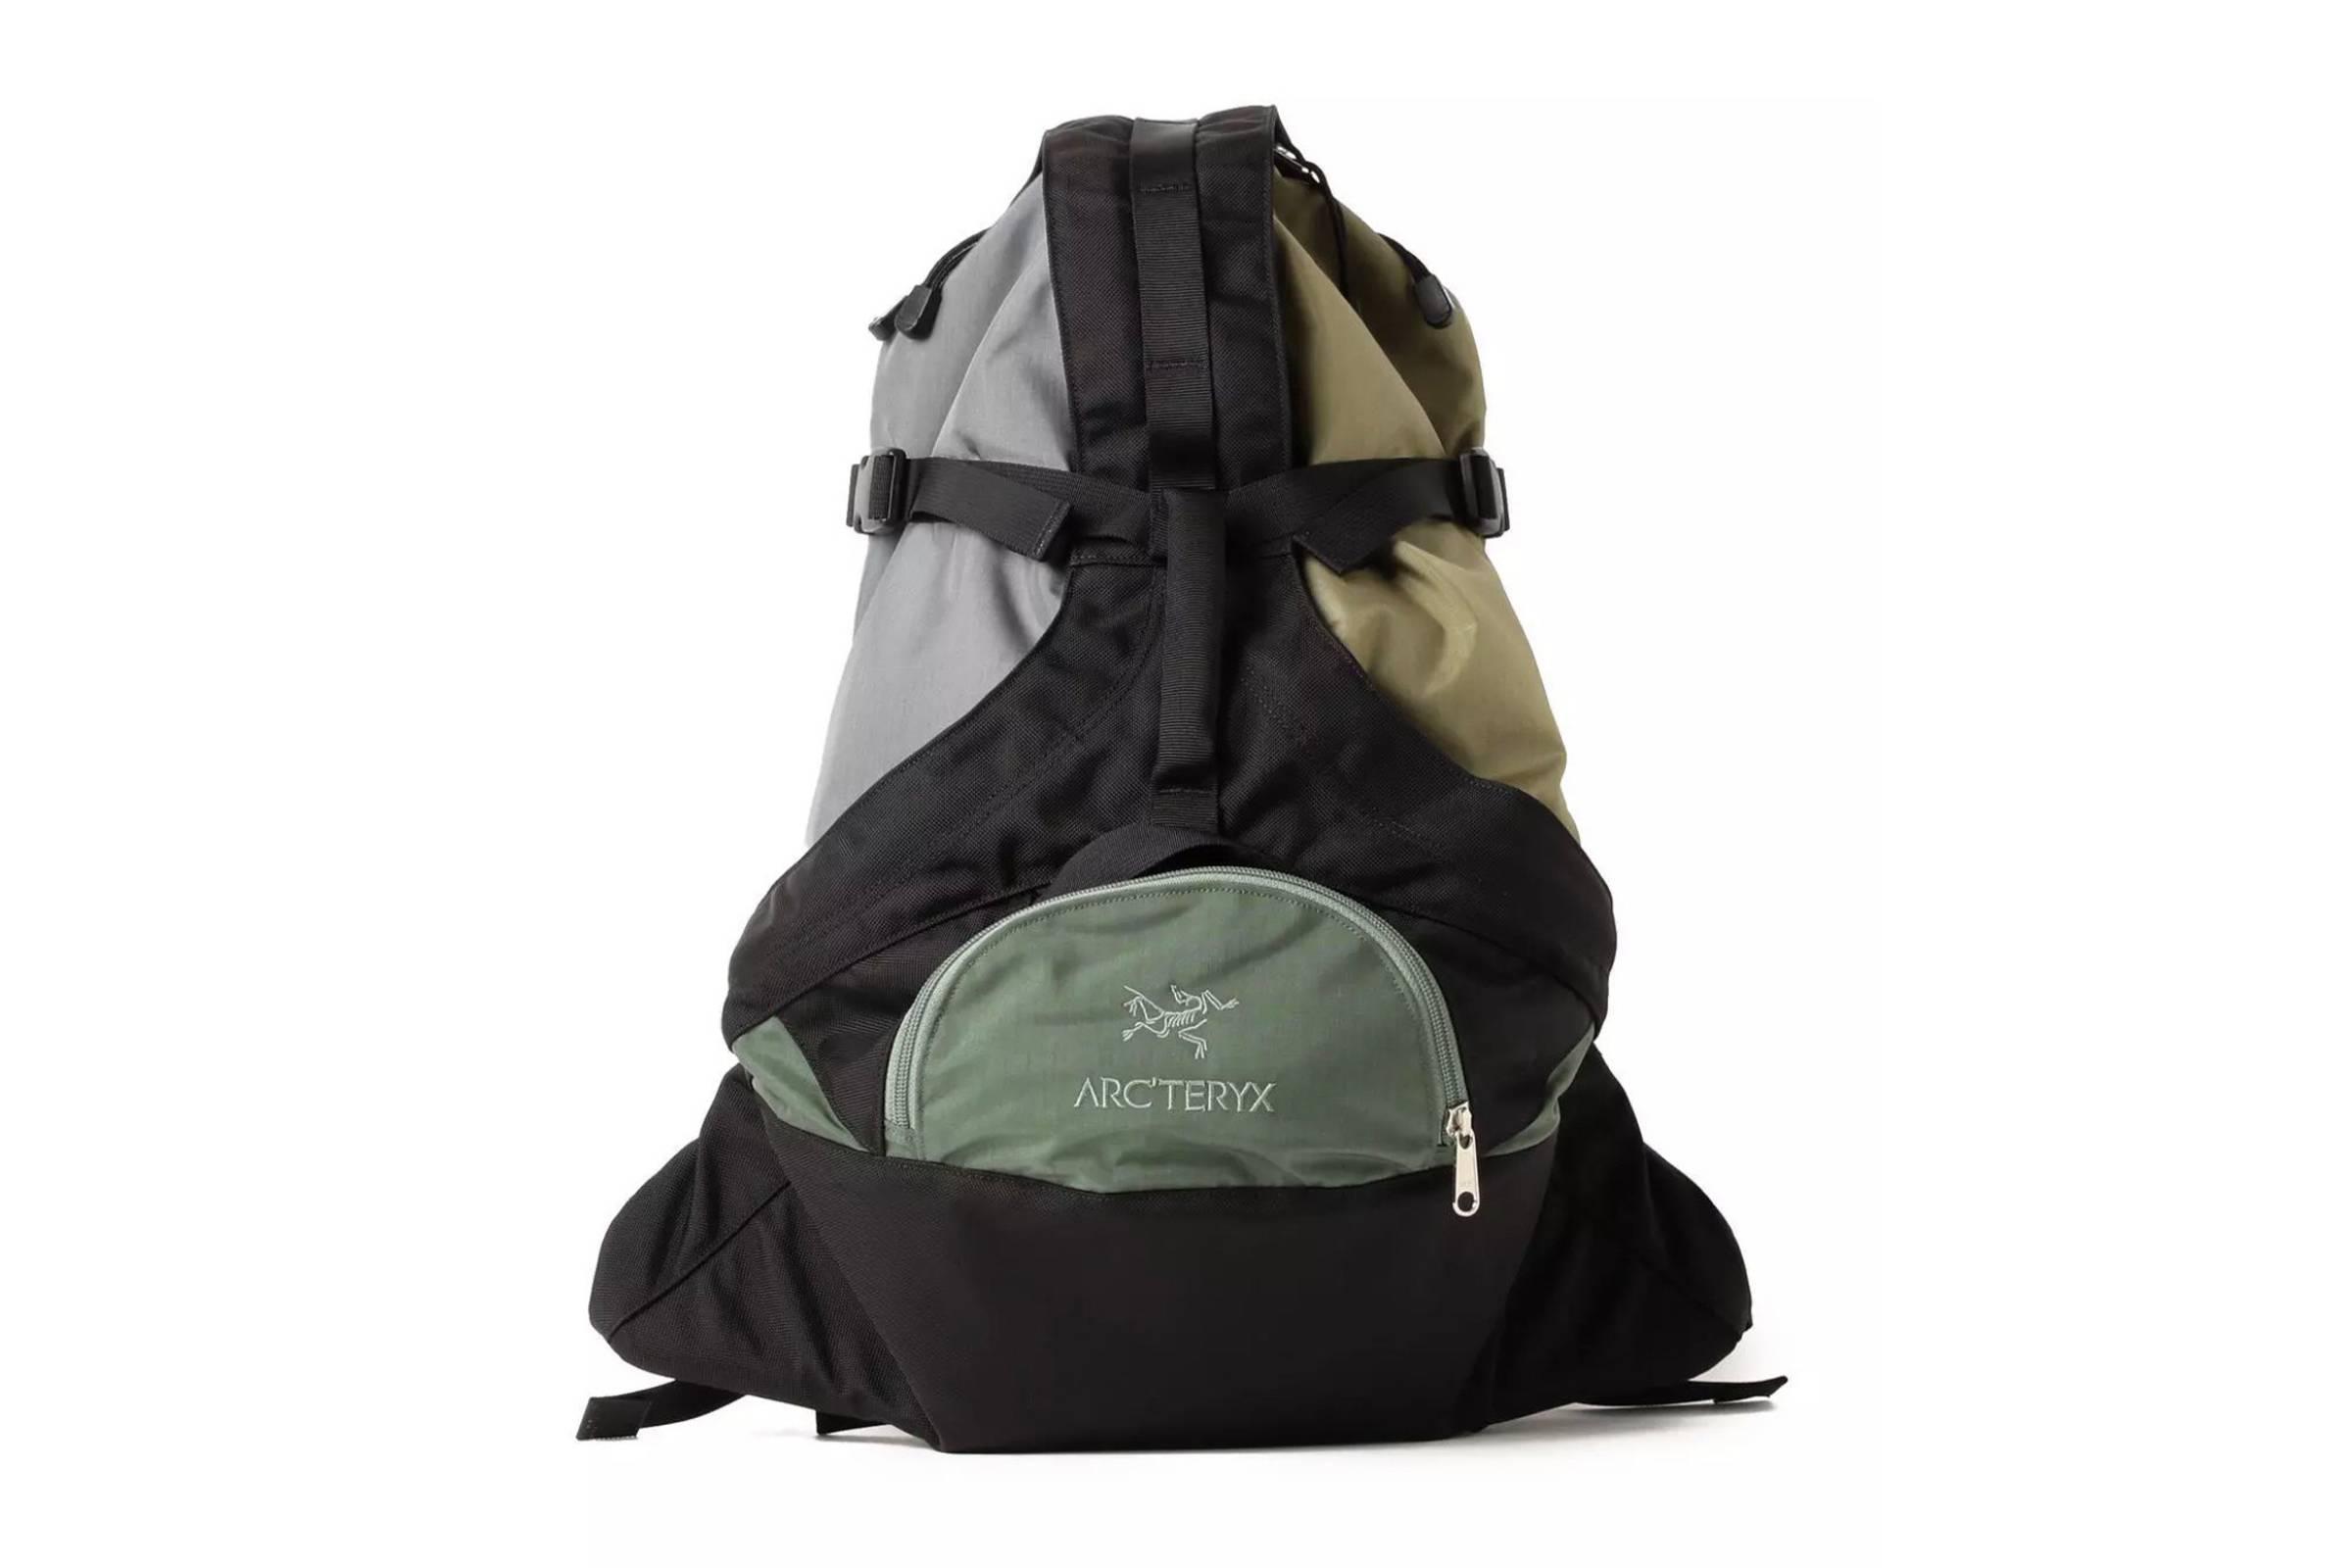 Beams x Arc'teryx Sebring 25L Backpack